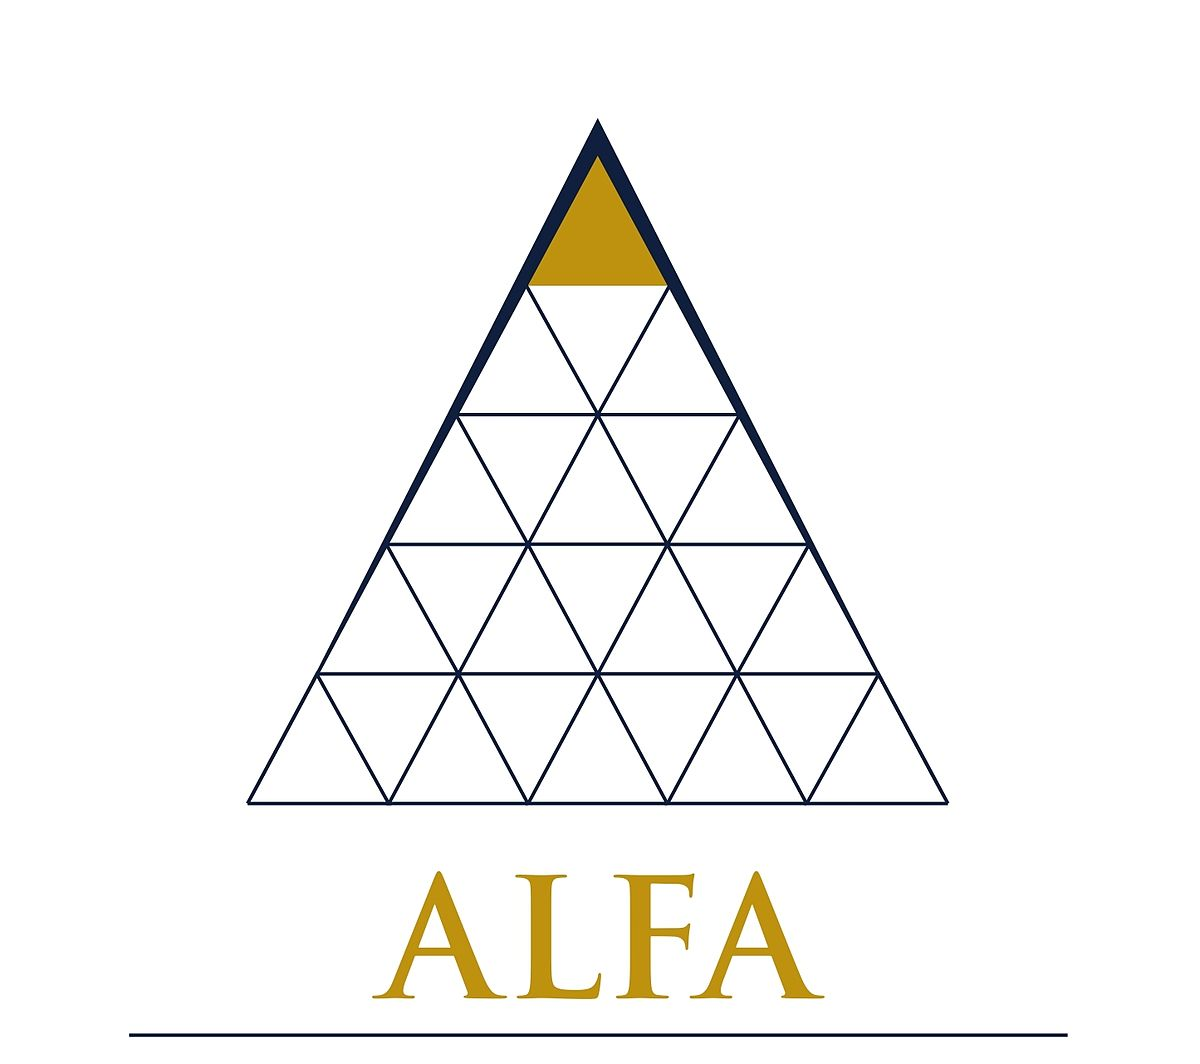 Conglomerado alfa wikip dia a enciclop dia livre - Banco de alimentos wikipedia ...